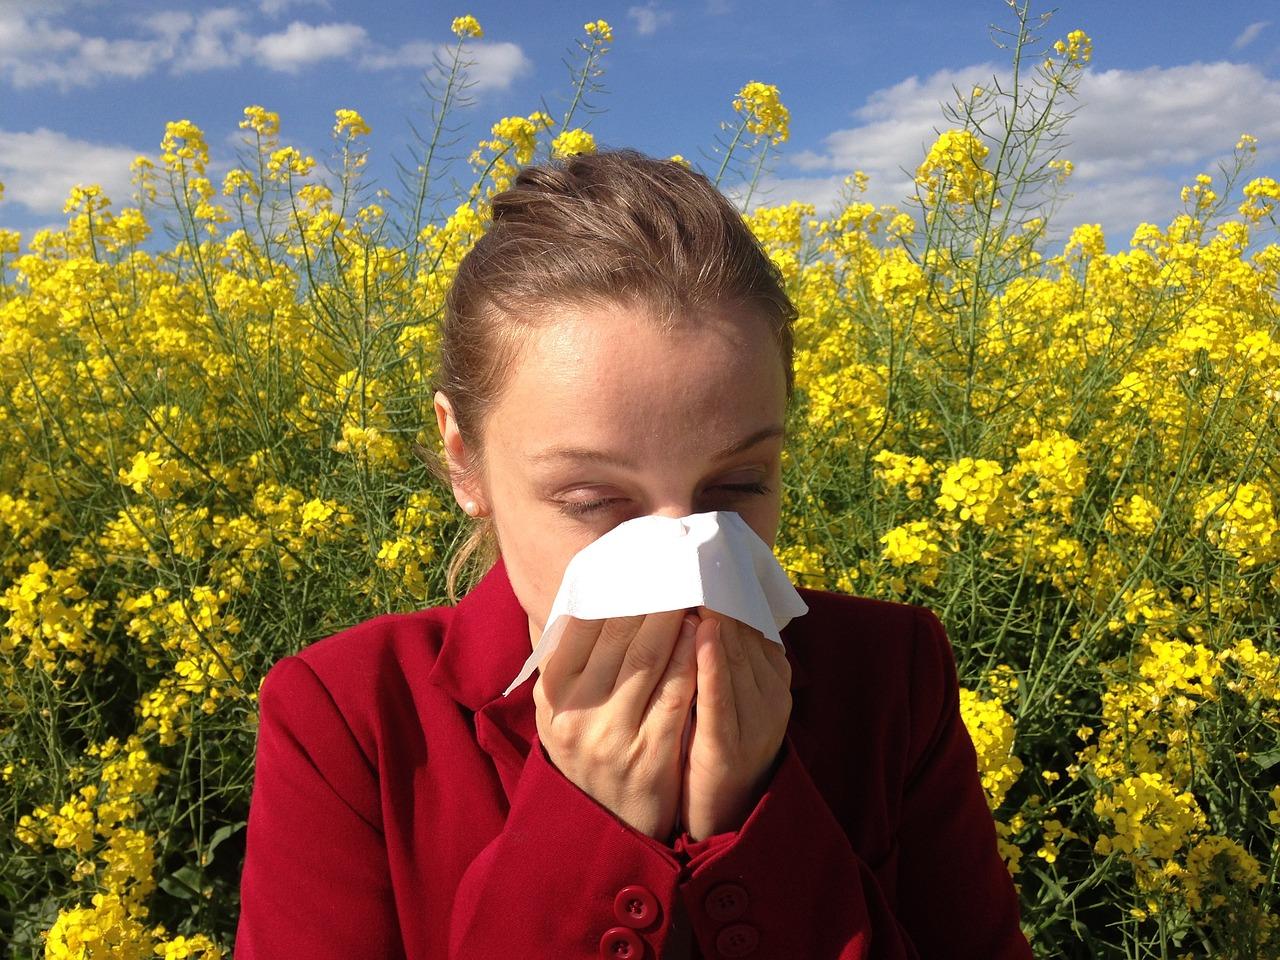 Les antihistaminiques naturels pour les allergies